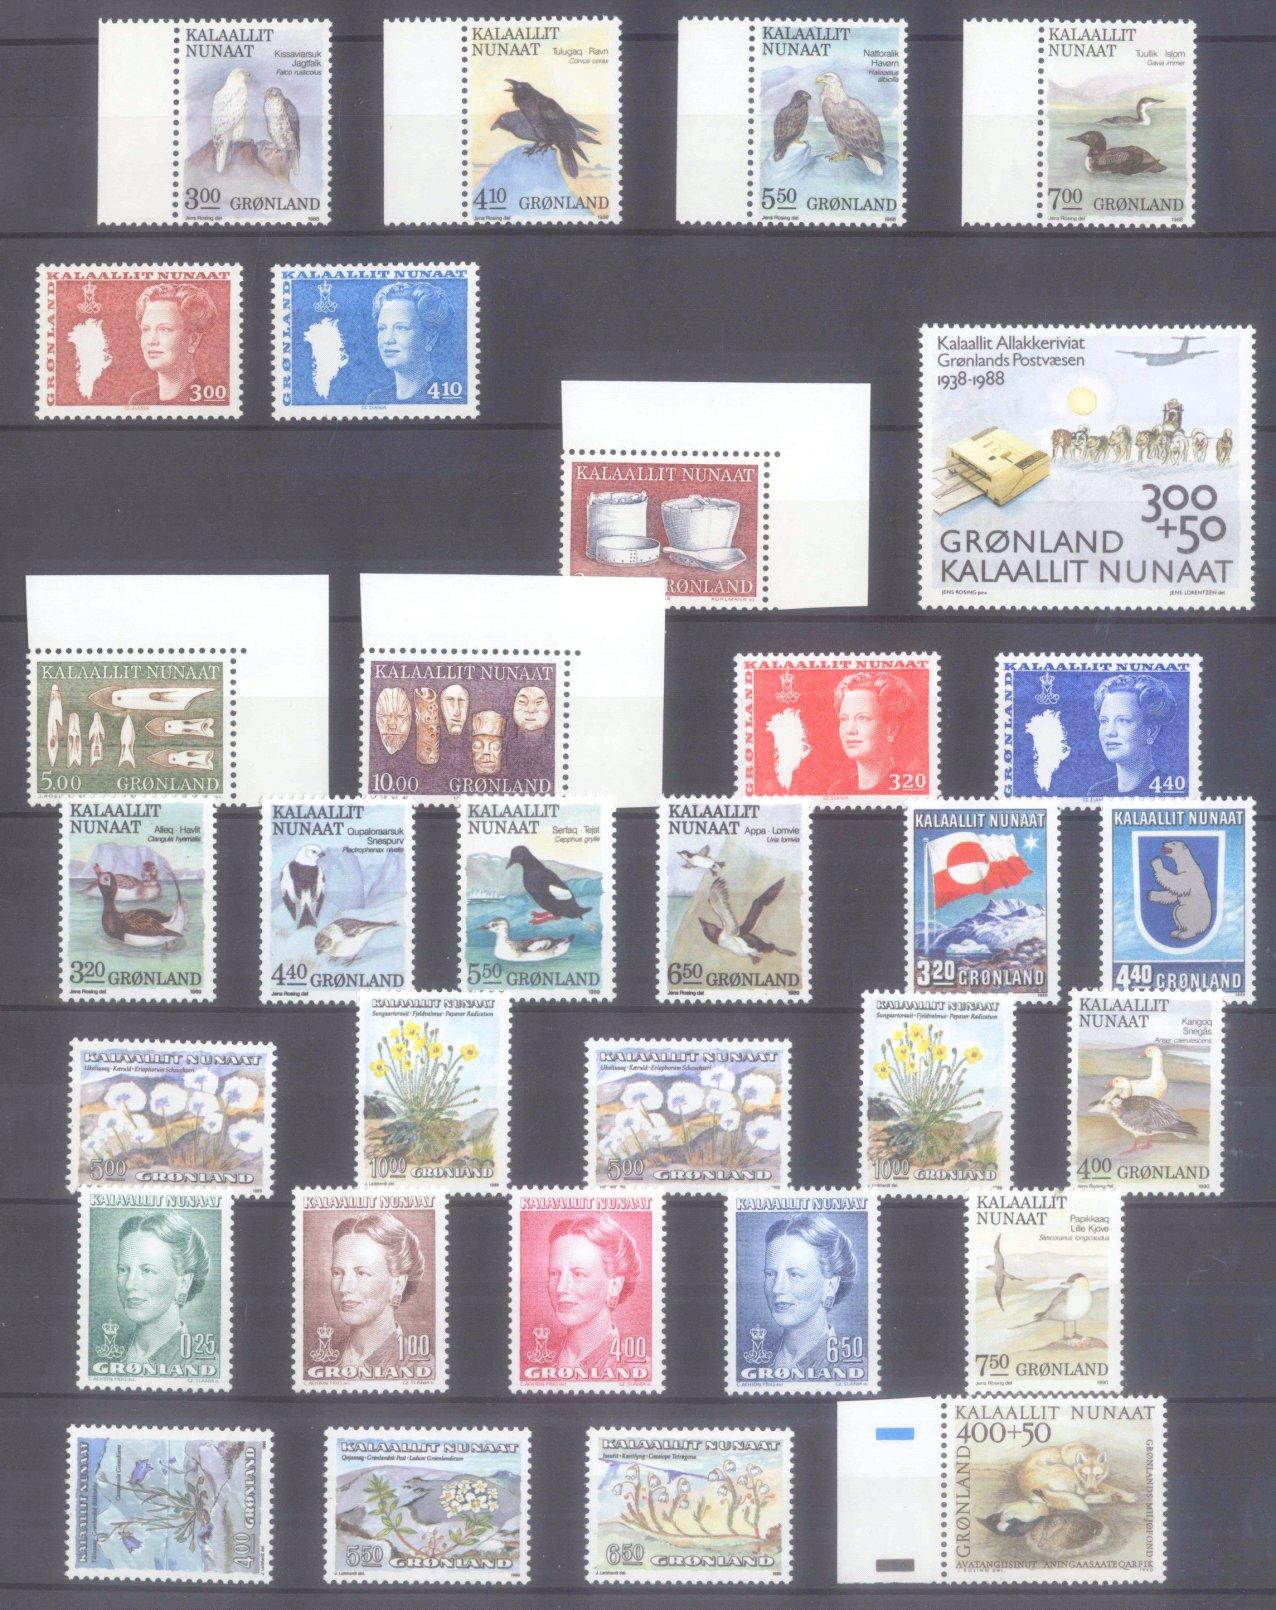 GRÖNLAND 1988-1995, Katalogwert fast 400,- Euro.